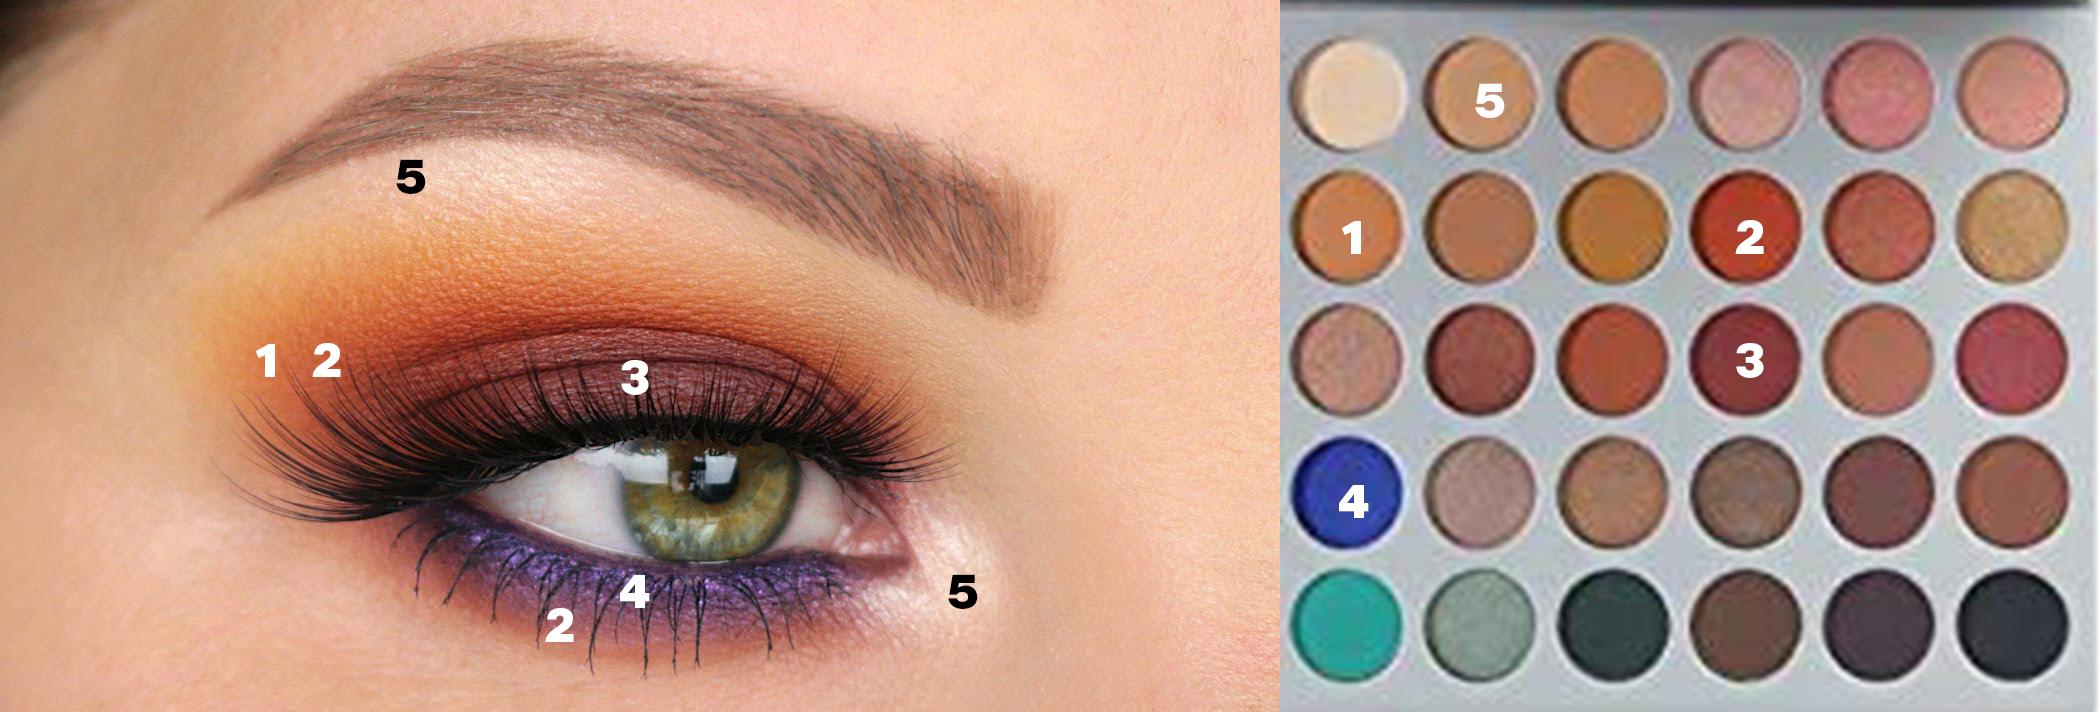 Jaclyn Hill palette sunset tutorial Eyemakeup Jaclyn